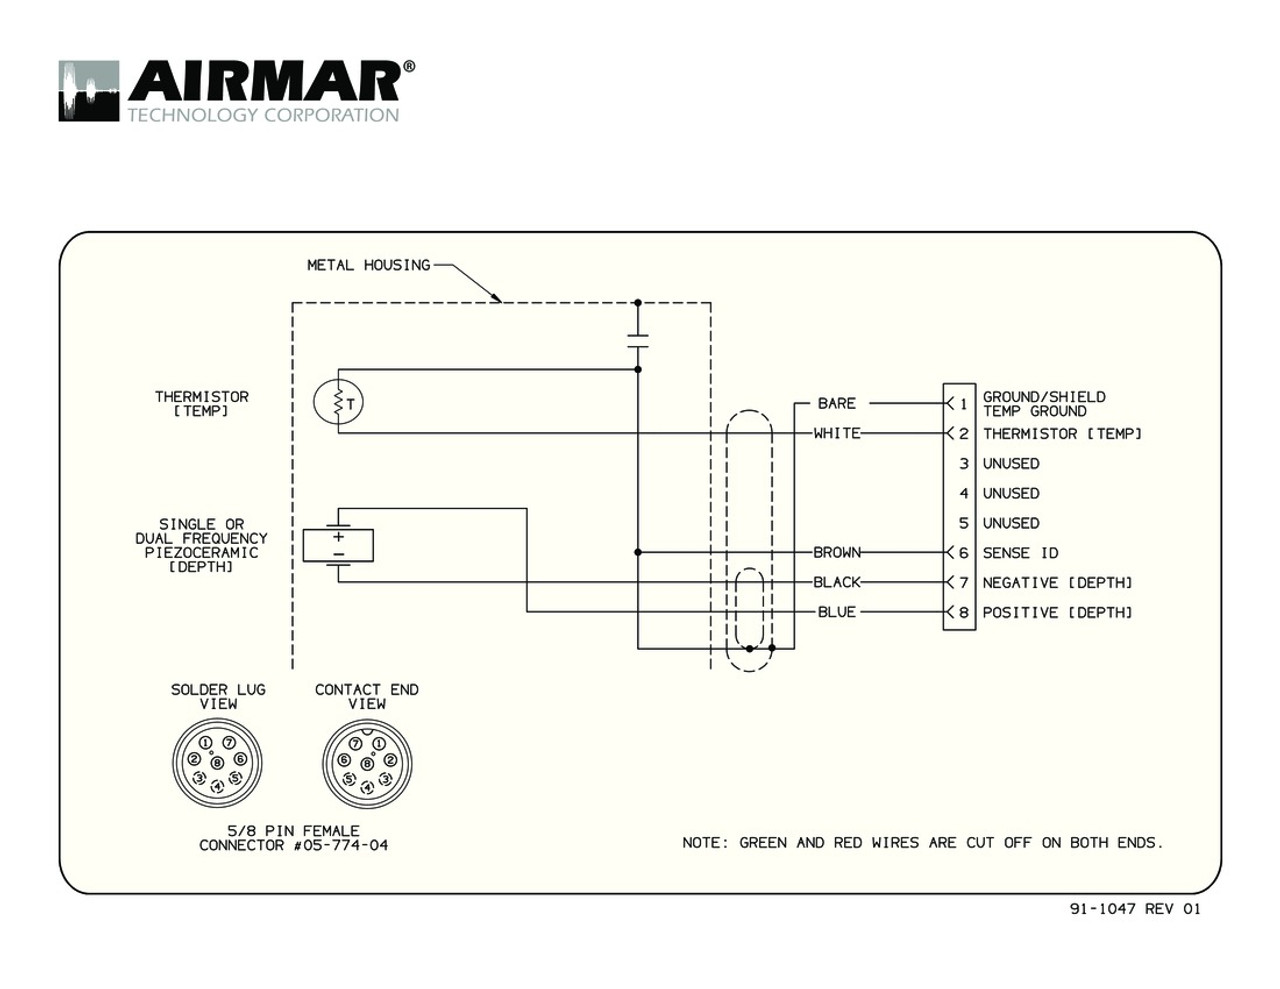 hight resolution of garmin gps 441s wiring diagram wiring schematic diagram 192garmin 441s wiring diagram wiring schematic diagram 192